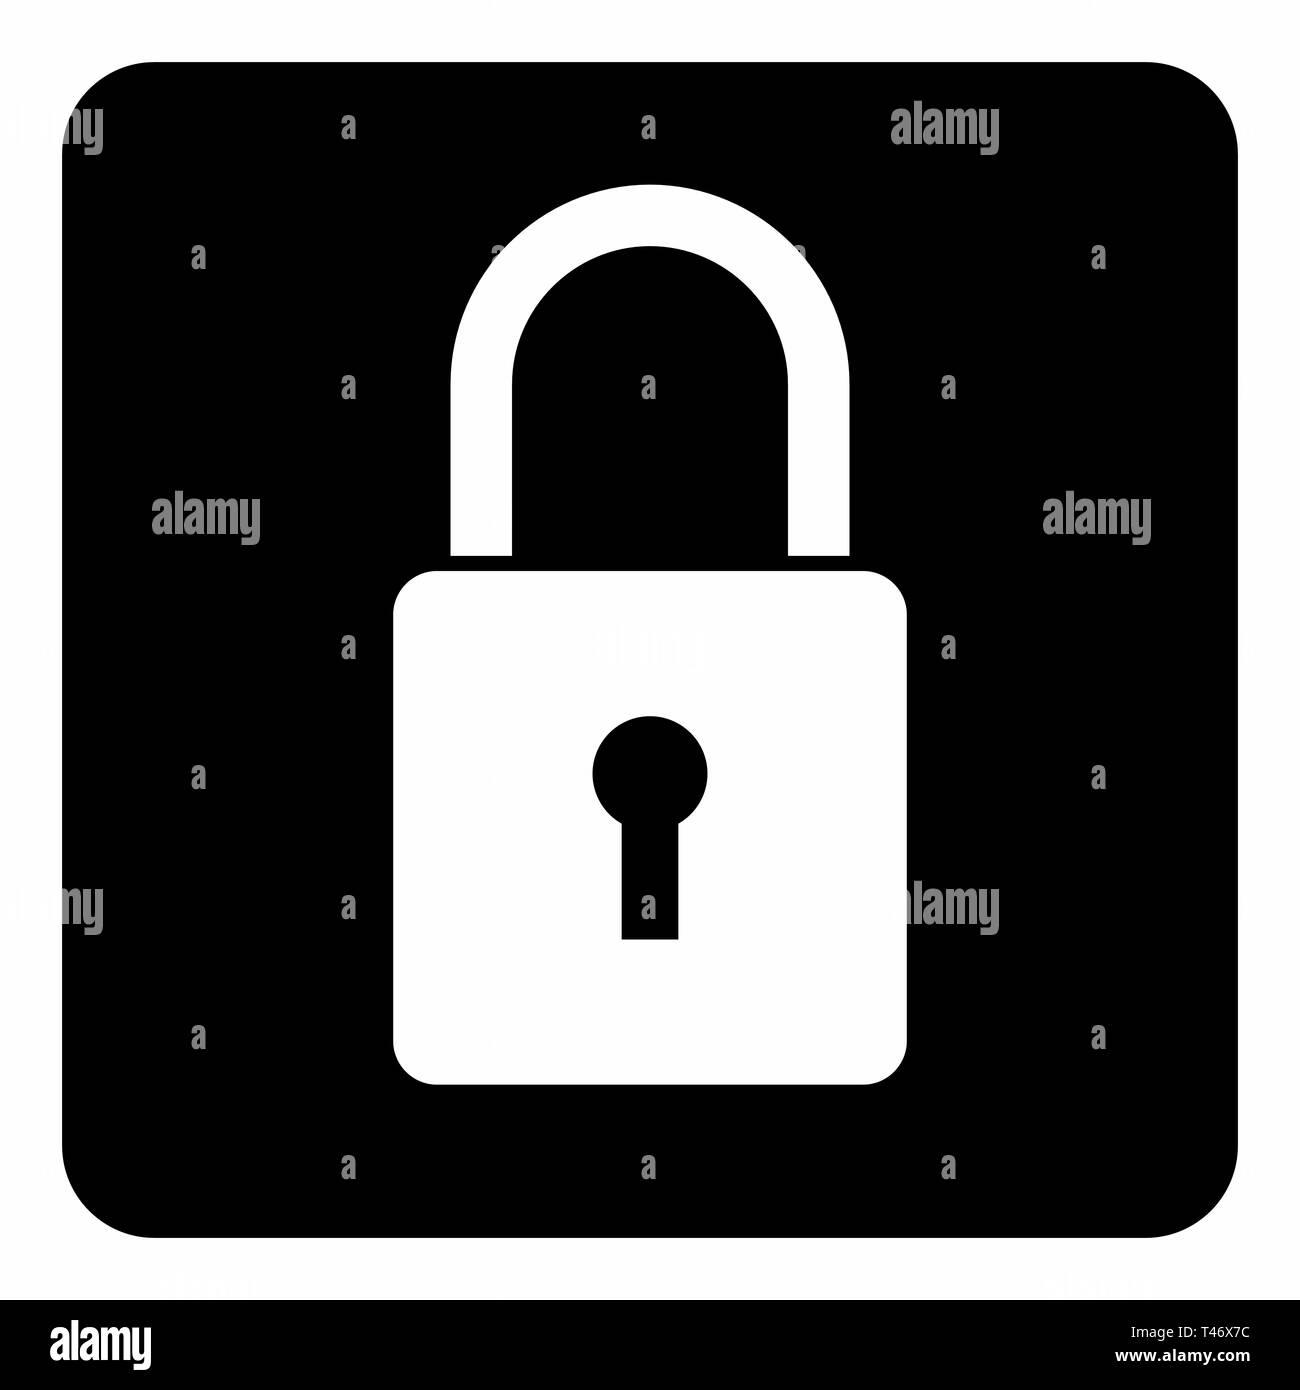 Padlock icon illustration - Stock Image